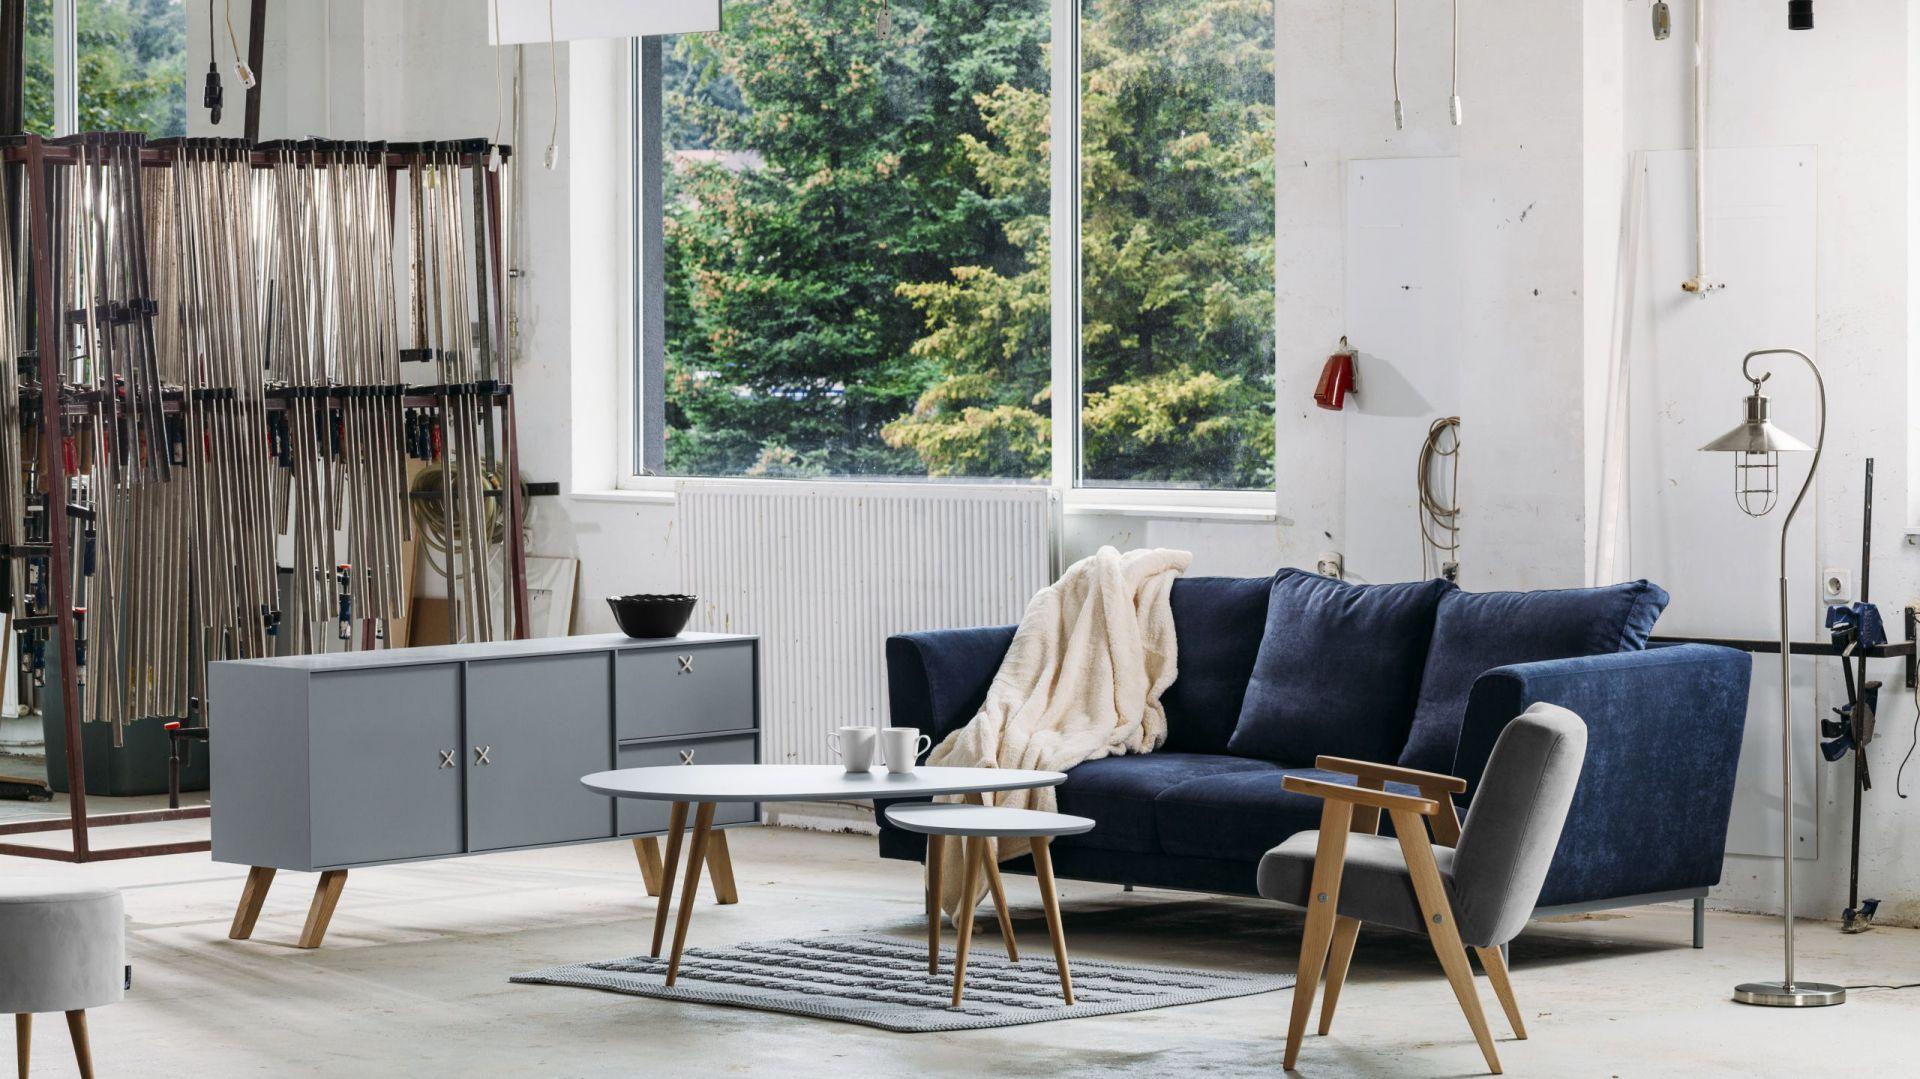 De Haute Qualite Awesome Salon Modern Evintage Ideas House Design Marcomilone